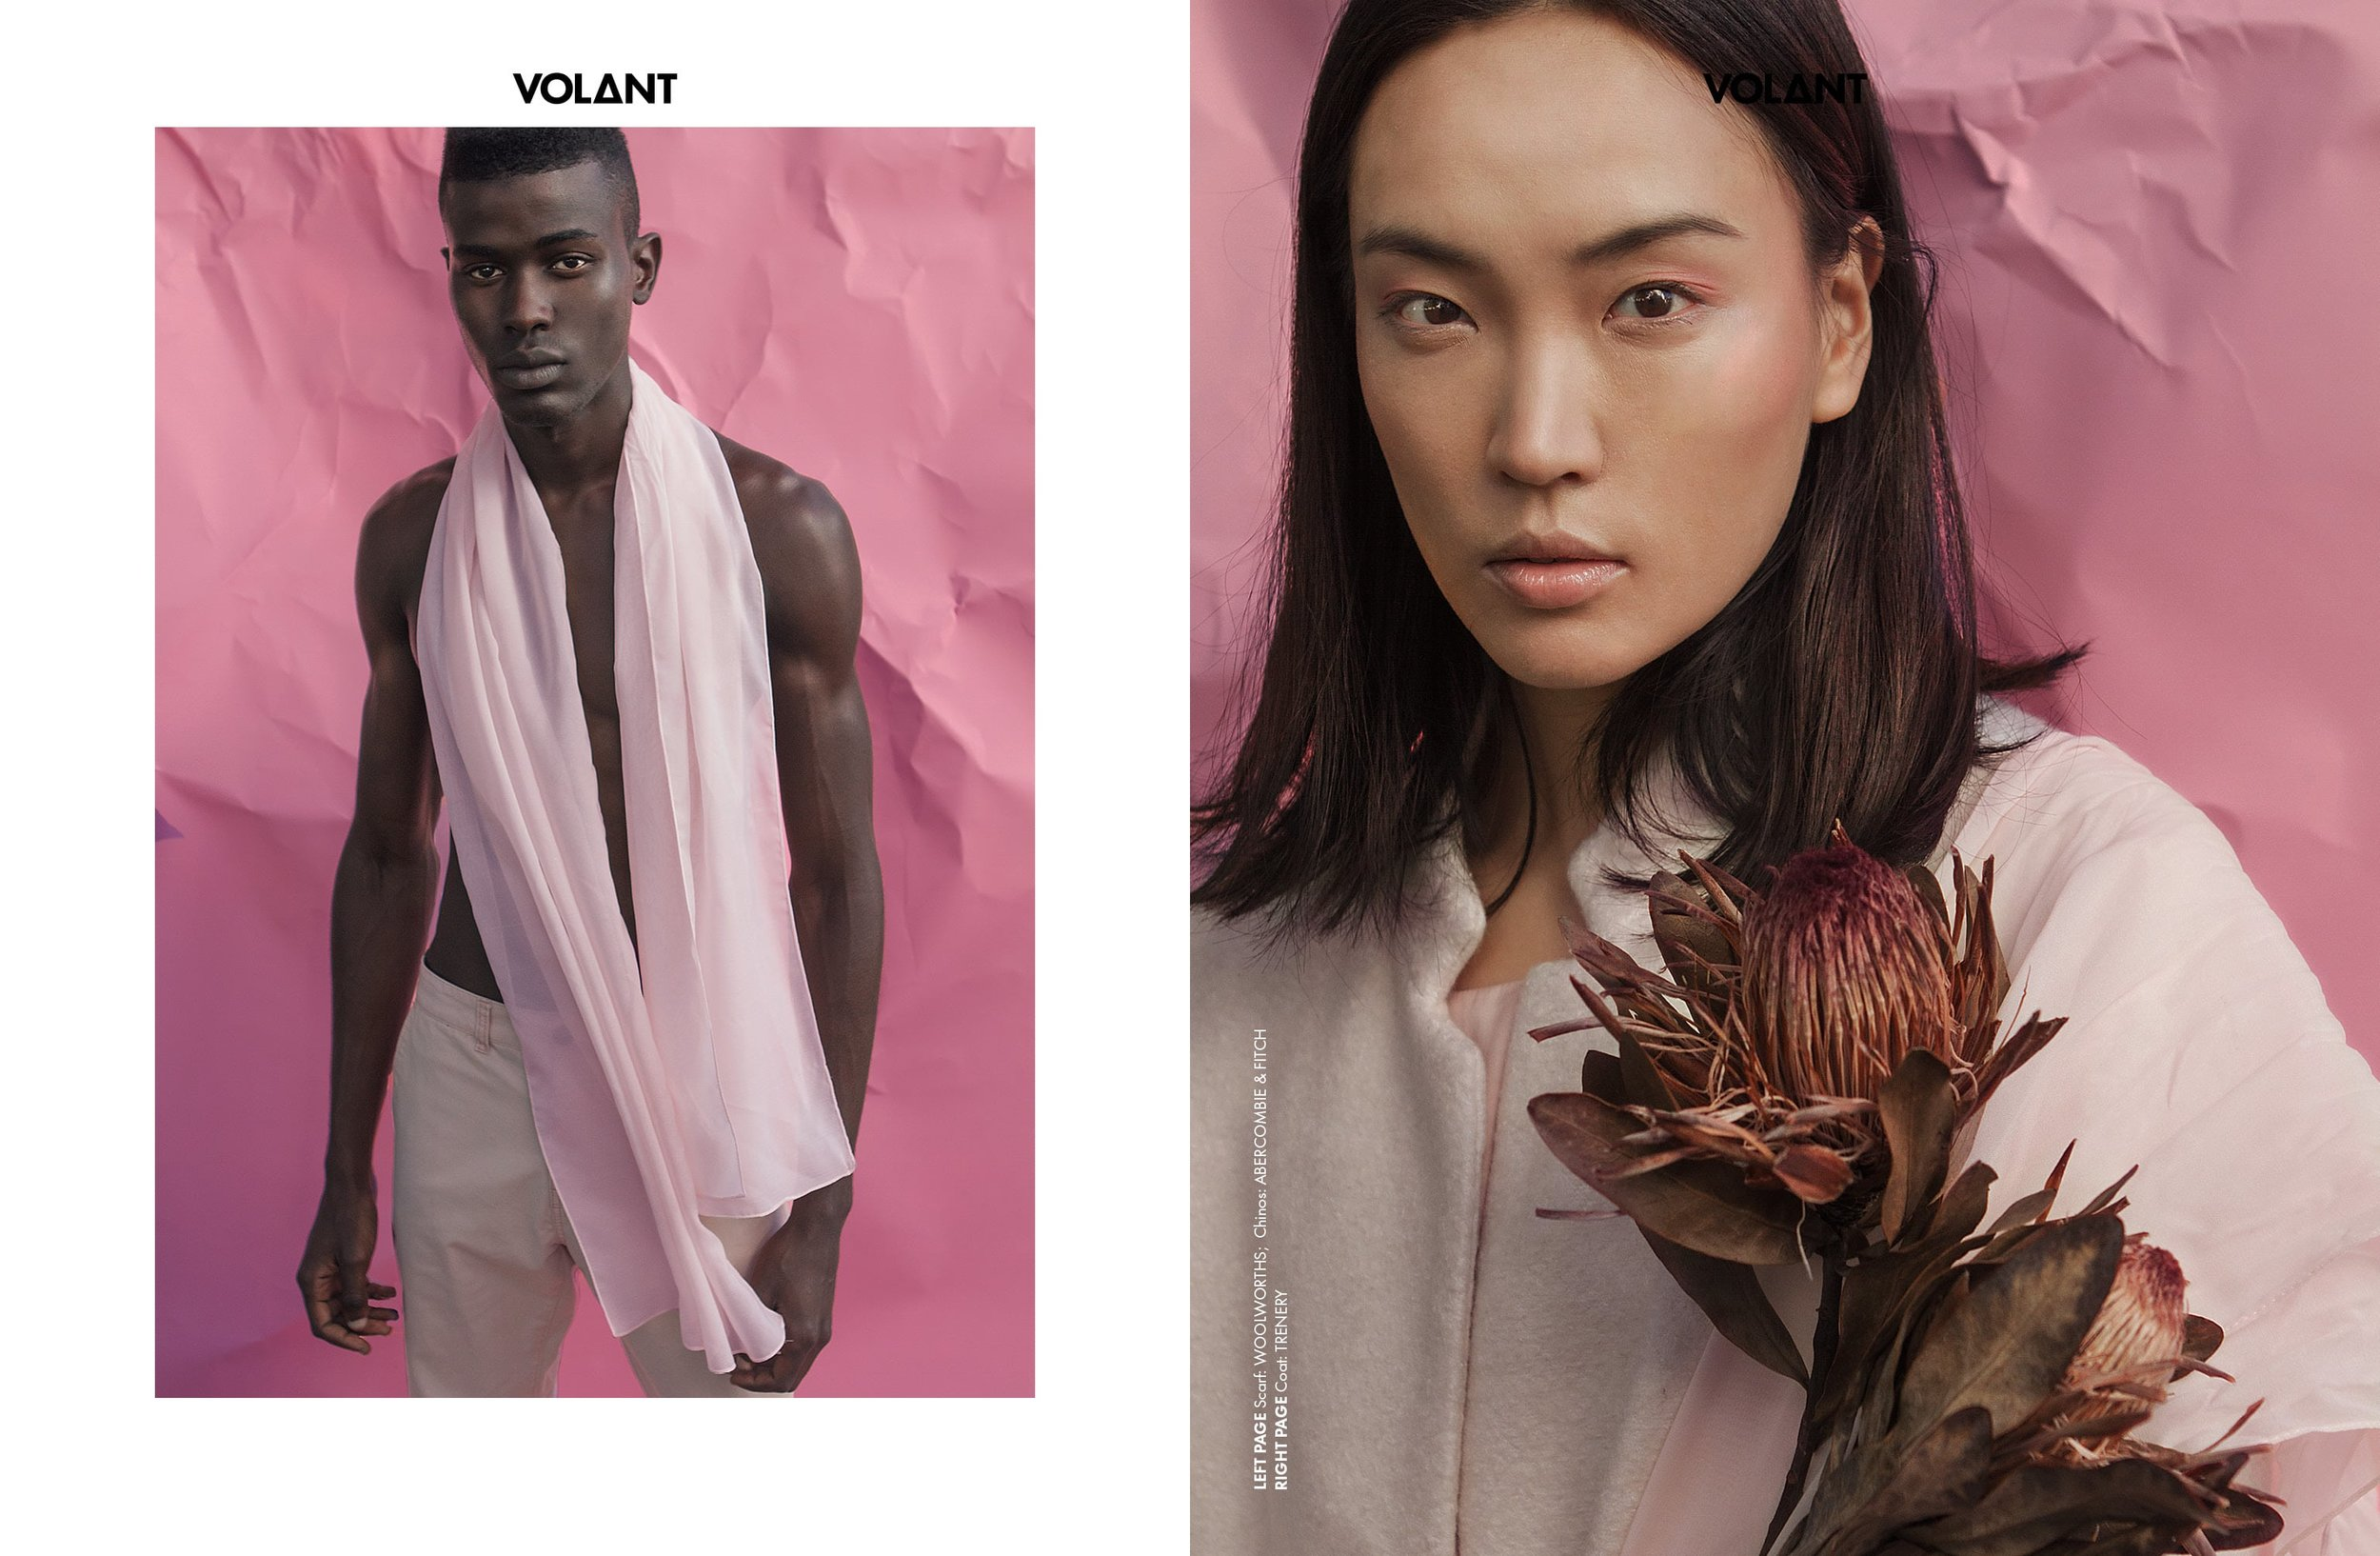 VOLANT-webitorial-pinkfuse3.jpg